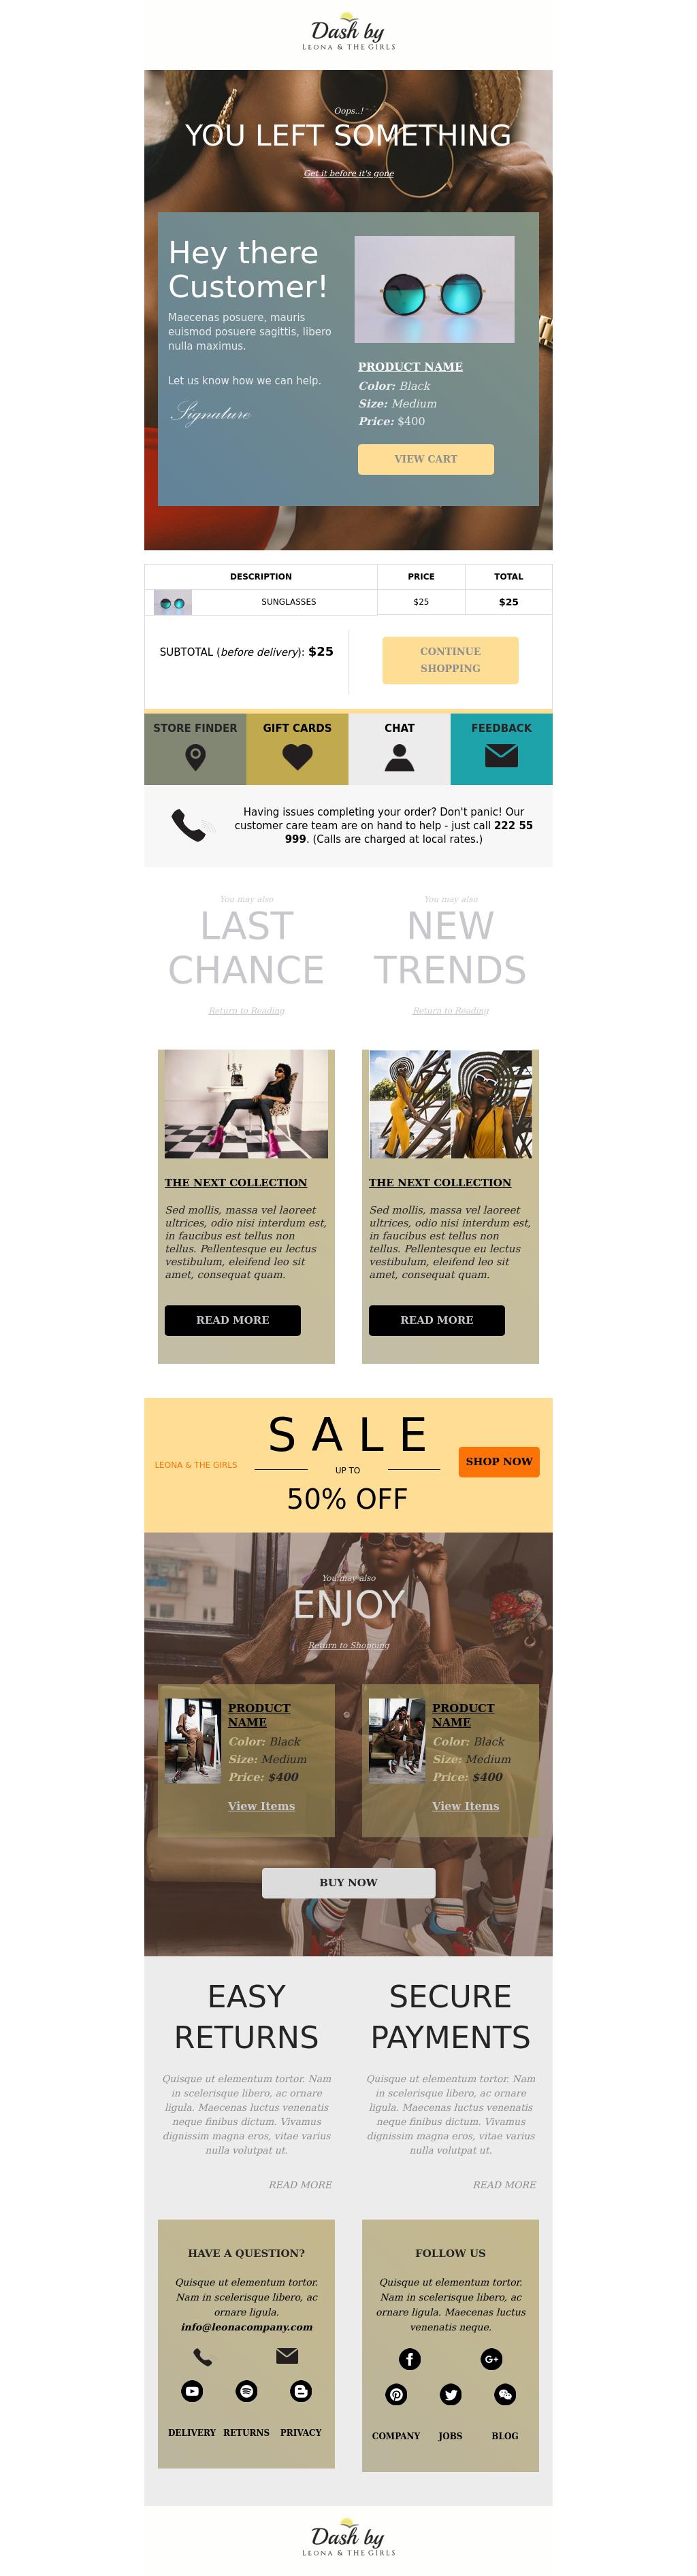 Fashion & beauty ecommerce cart abandoned template